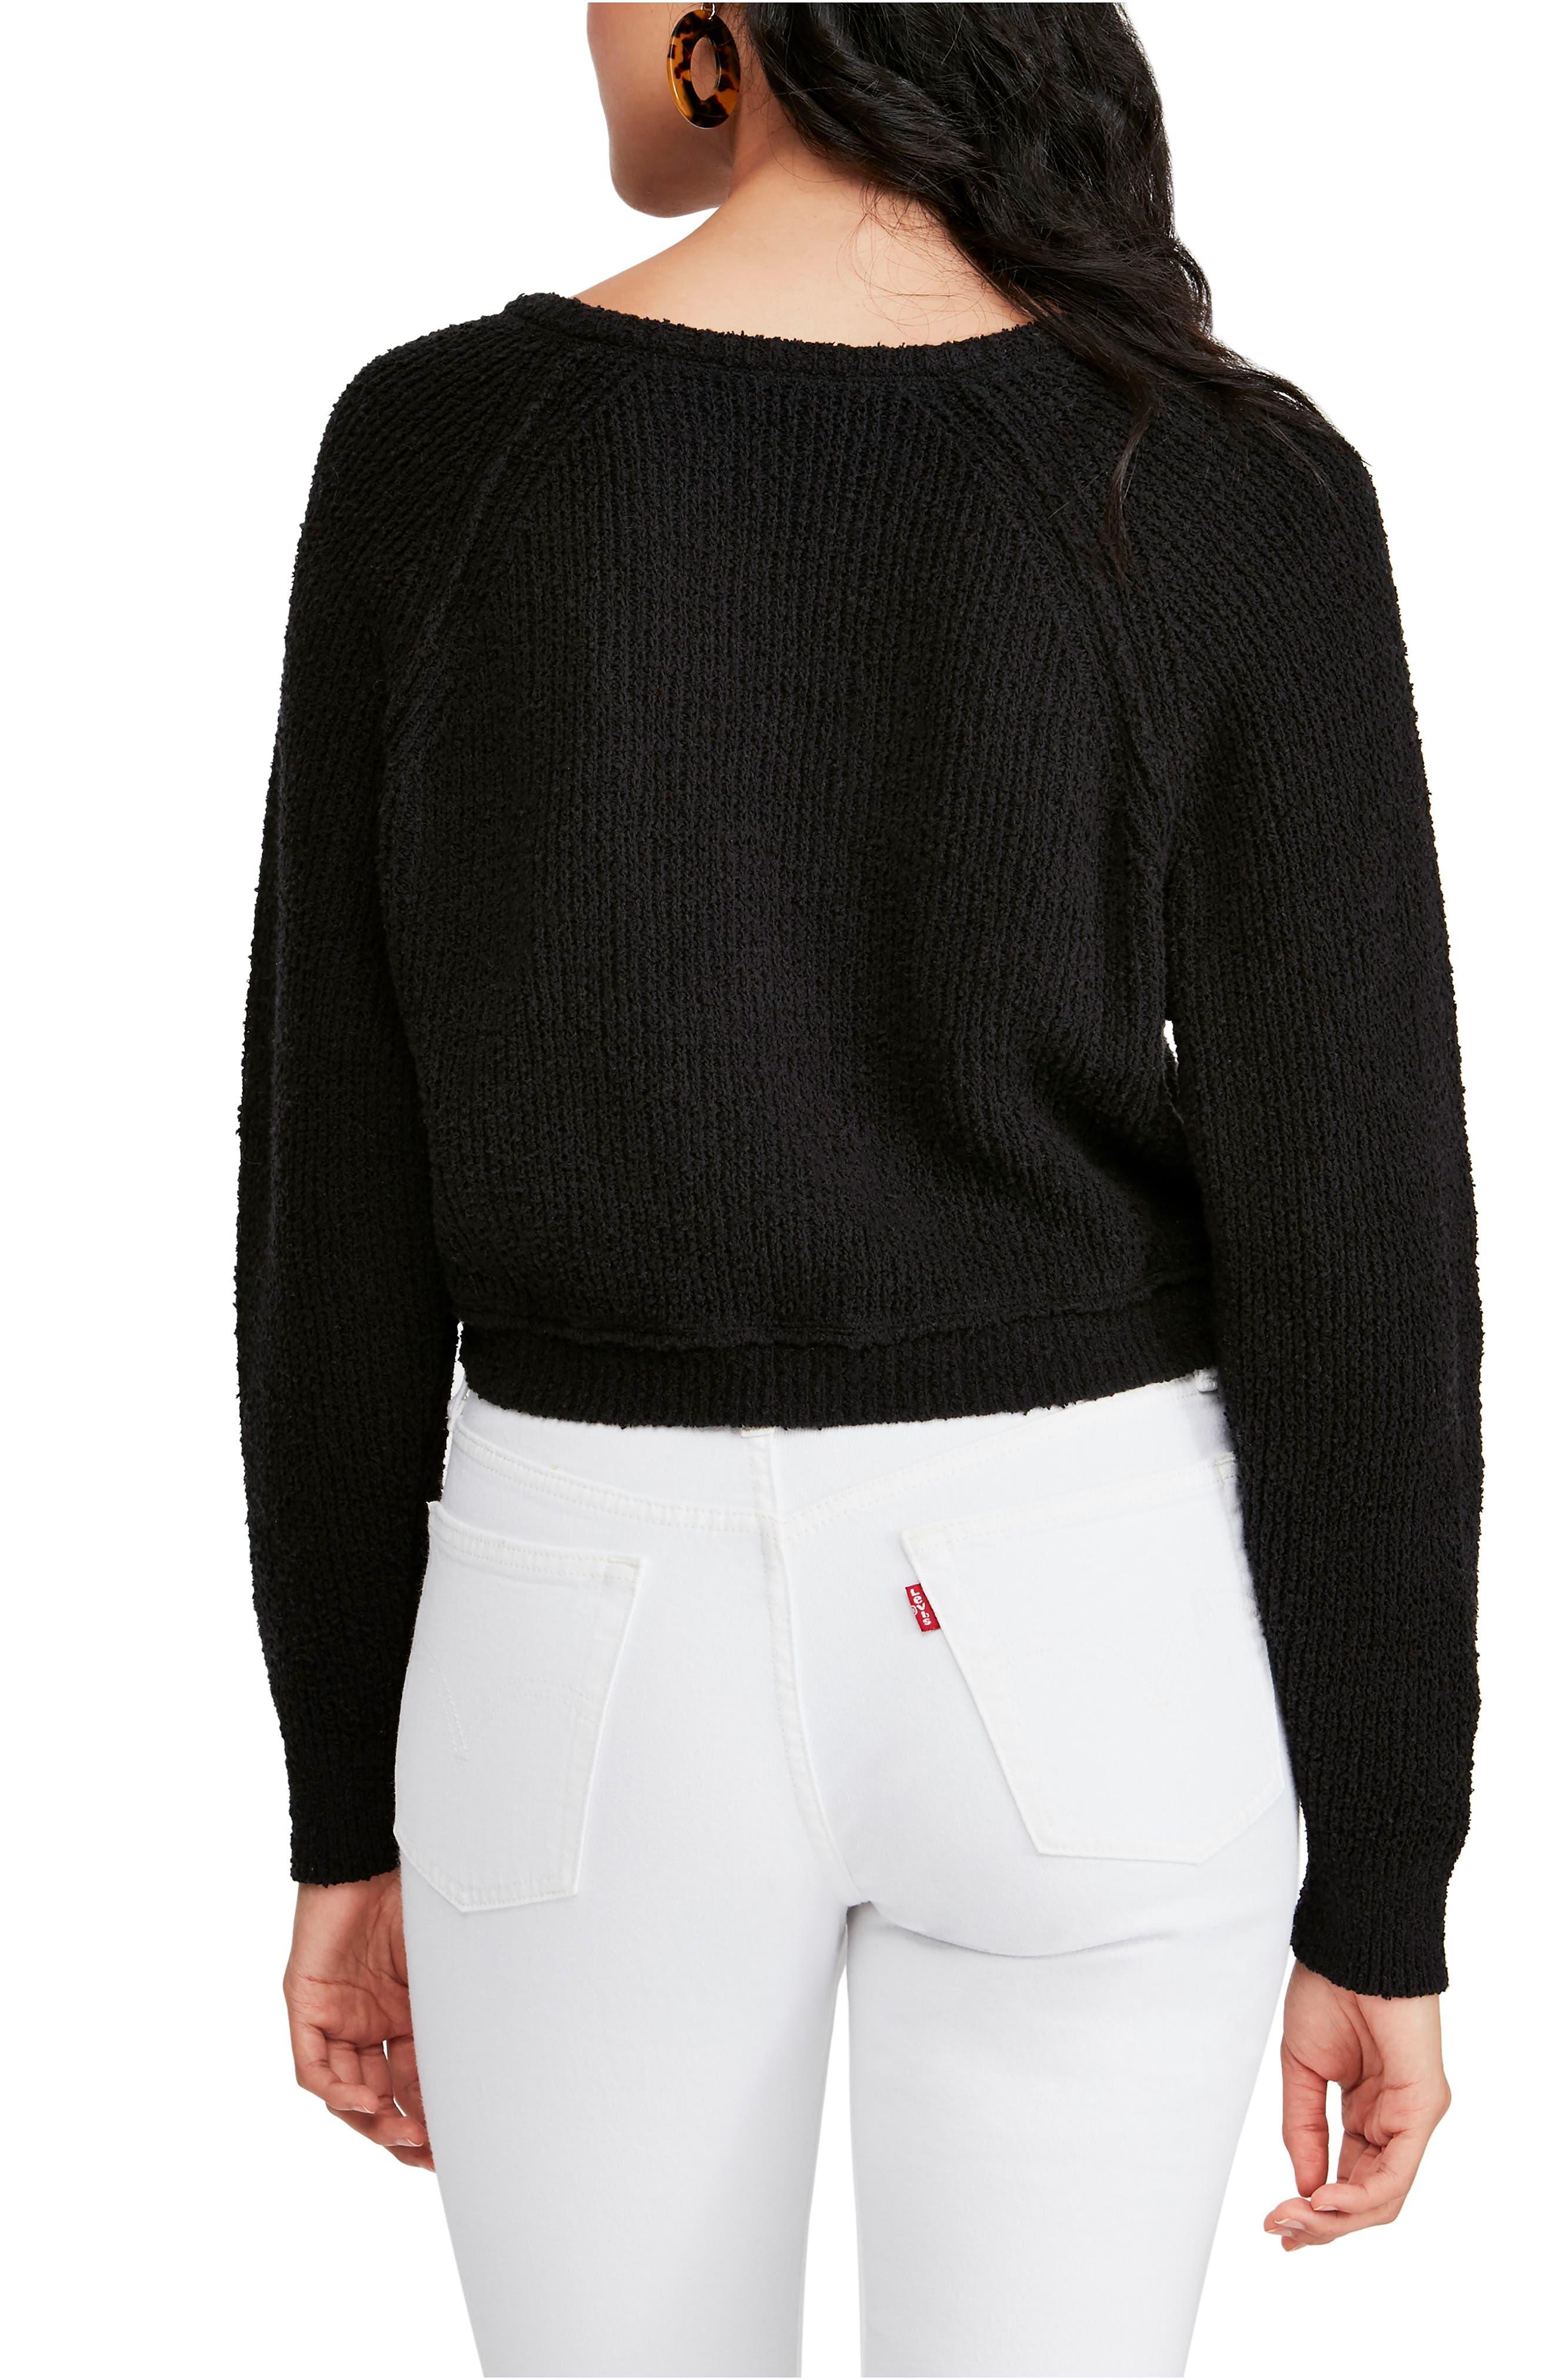 FREE PEOPLE,                             V-Neck Sweater,                             Alternate thumbnail 2, color,                             BLACK